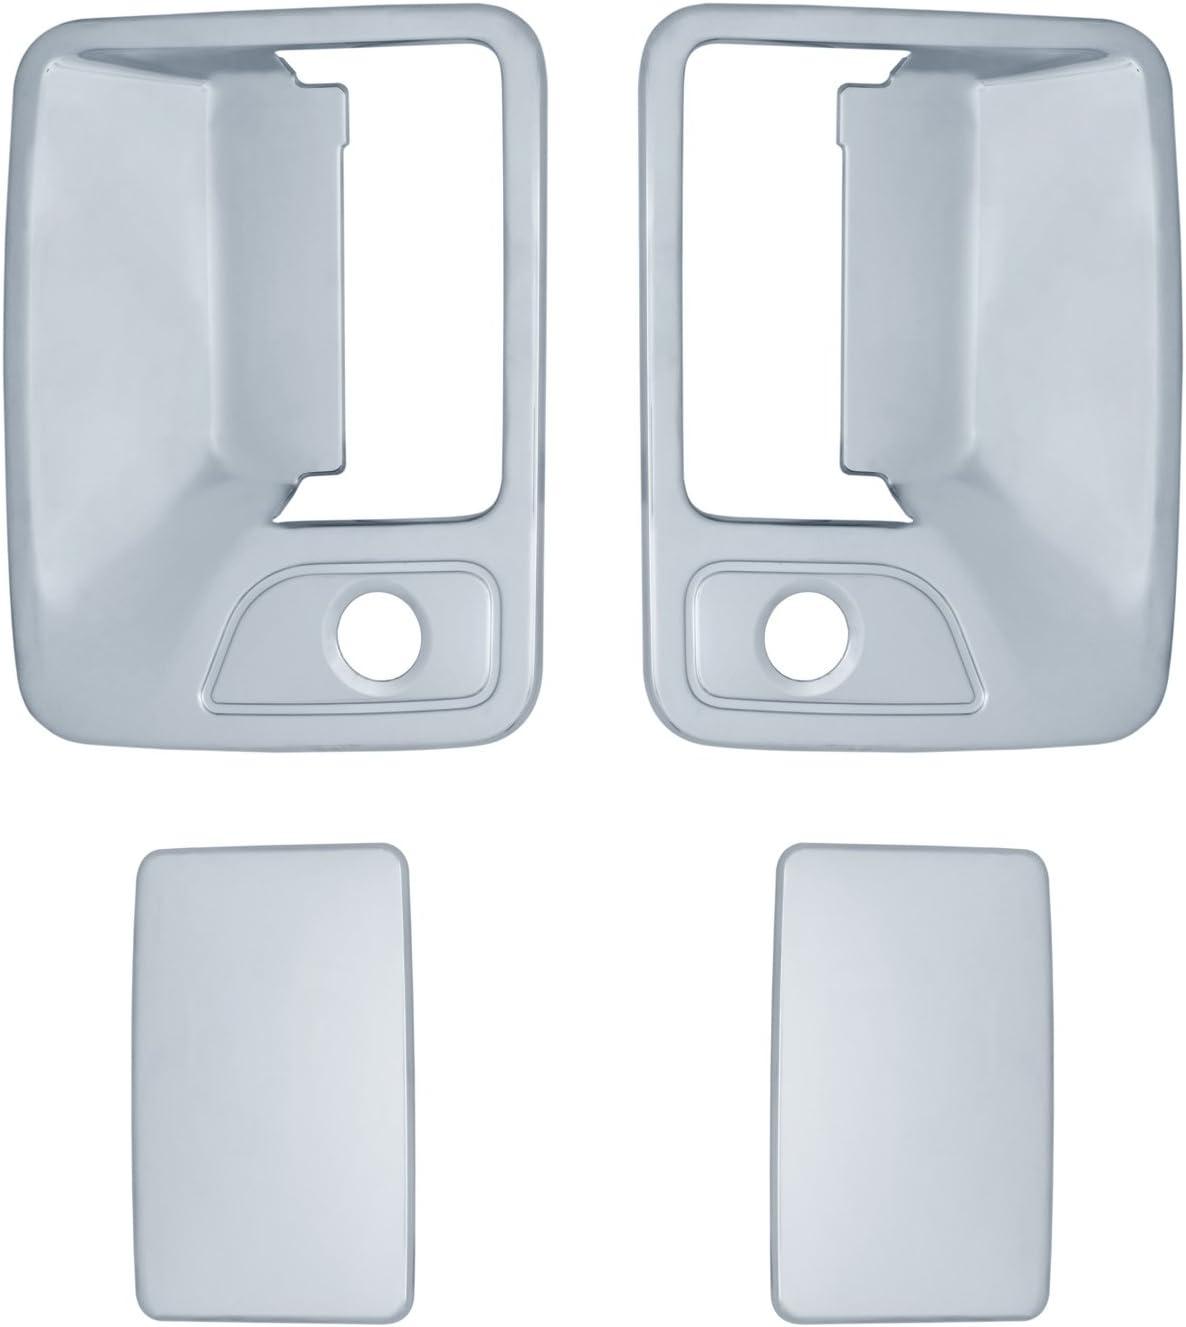 2 Piece Brite Chrome 11205K Chrome Door Handle Cover with Pass Keyhole